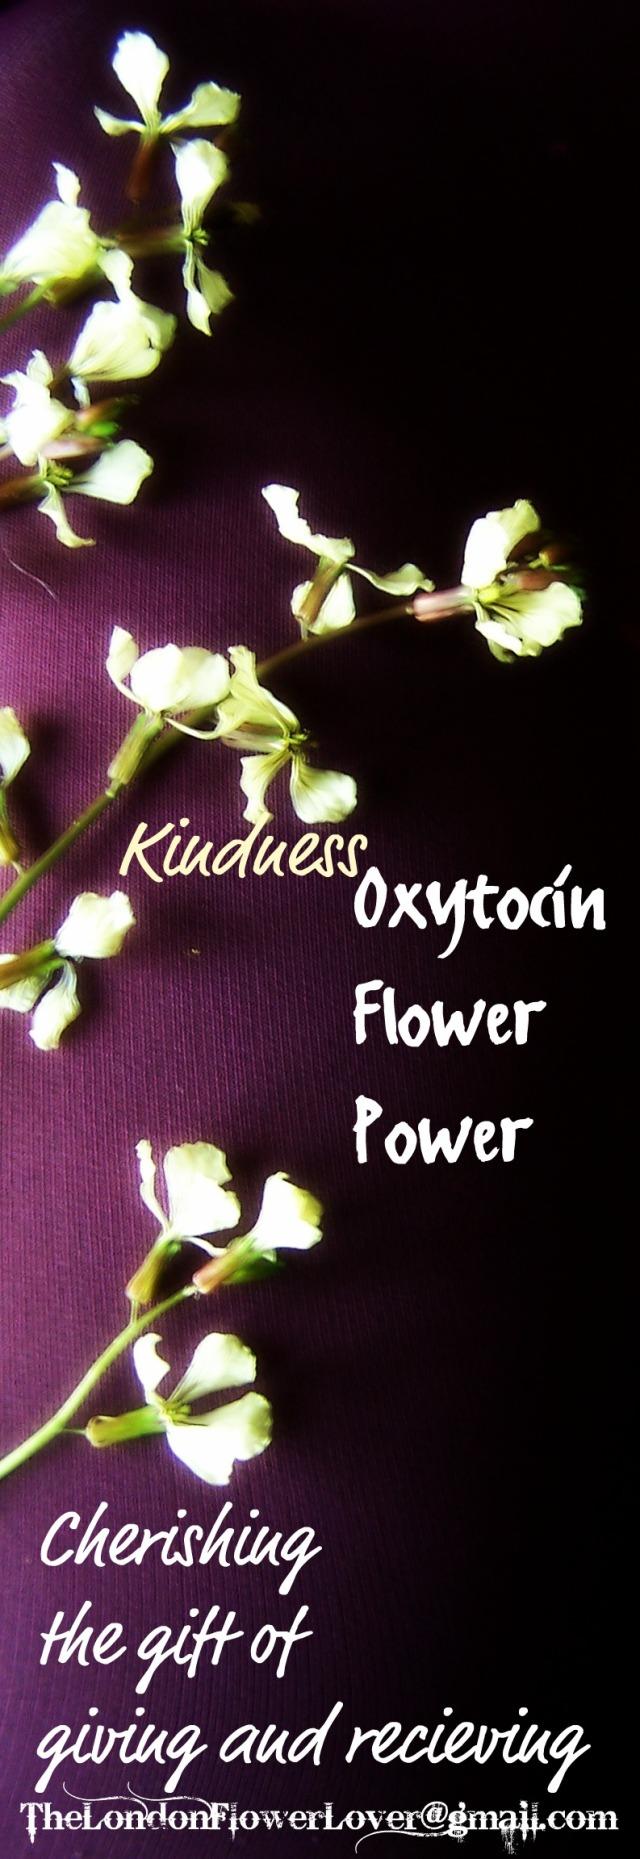 kindness oxytocin spring 2012 flowers 028